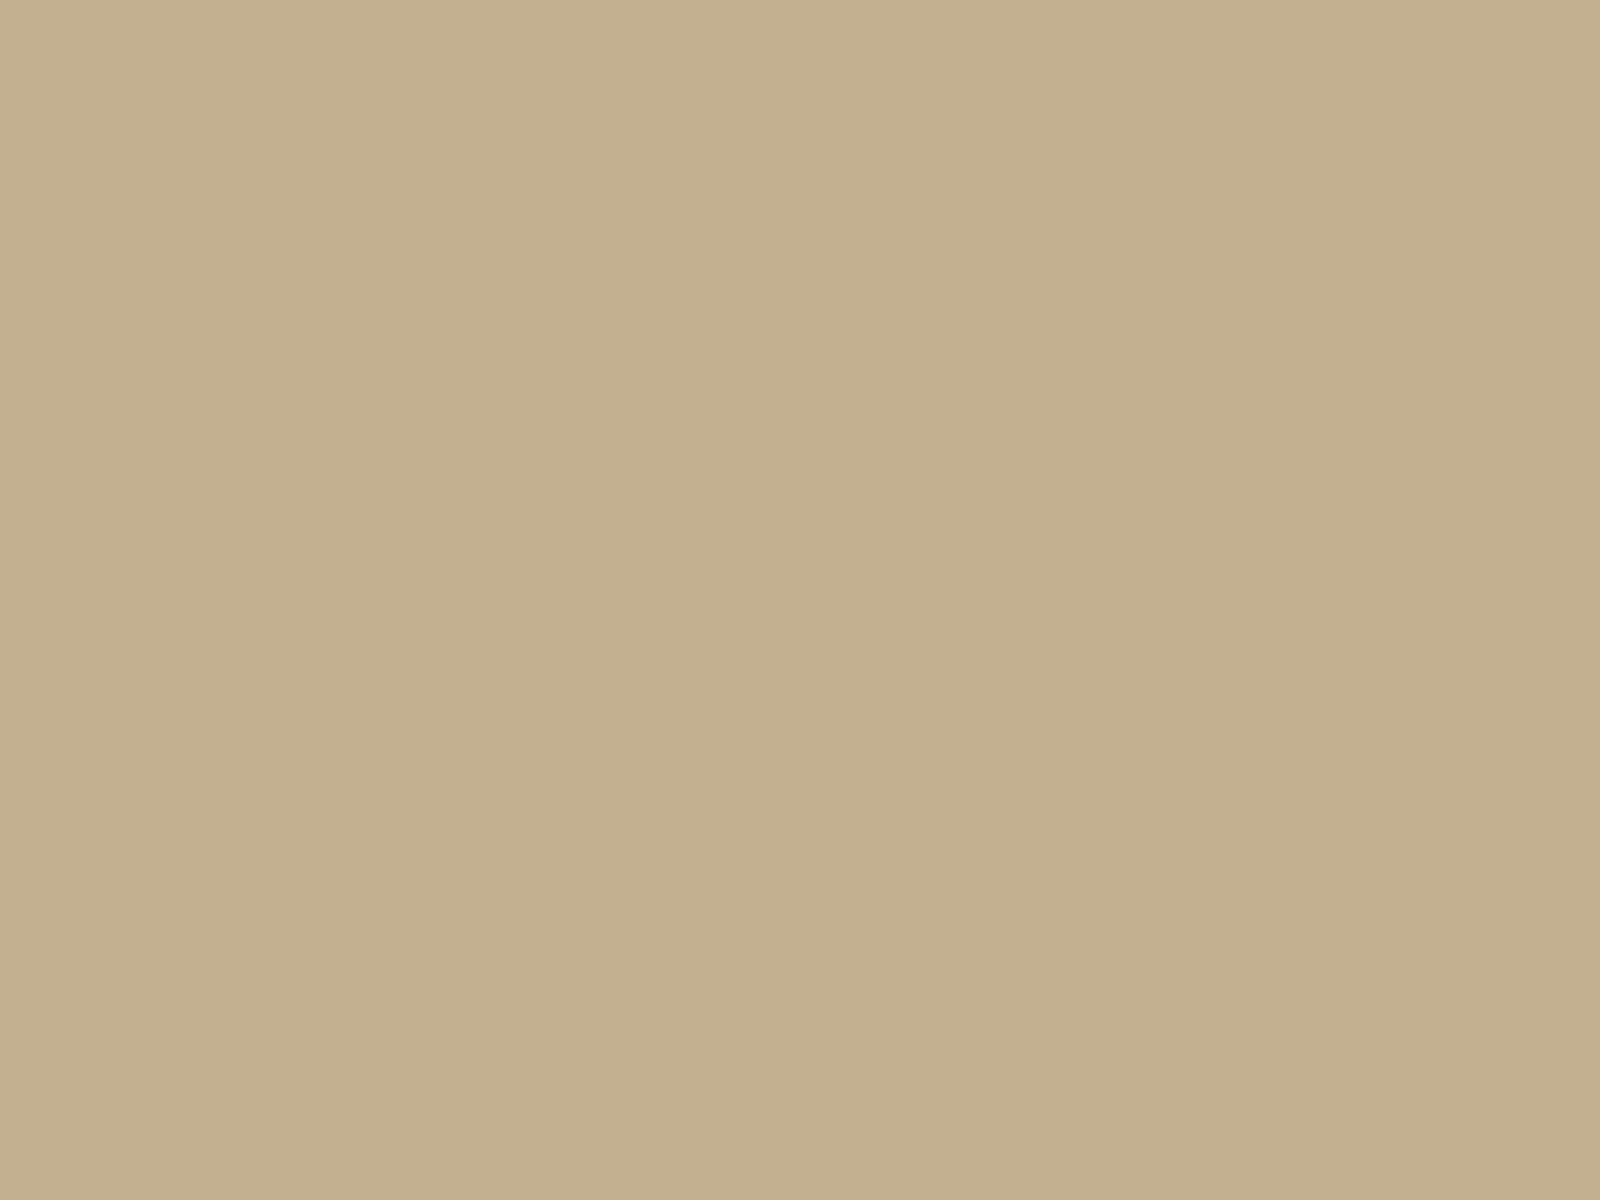 1600x1200 Khaki Web Solid Color Background